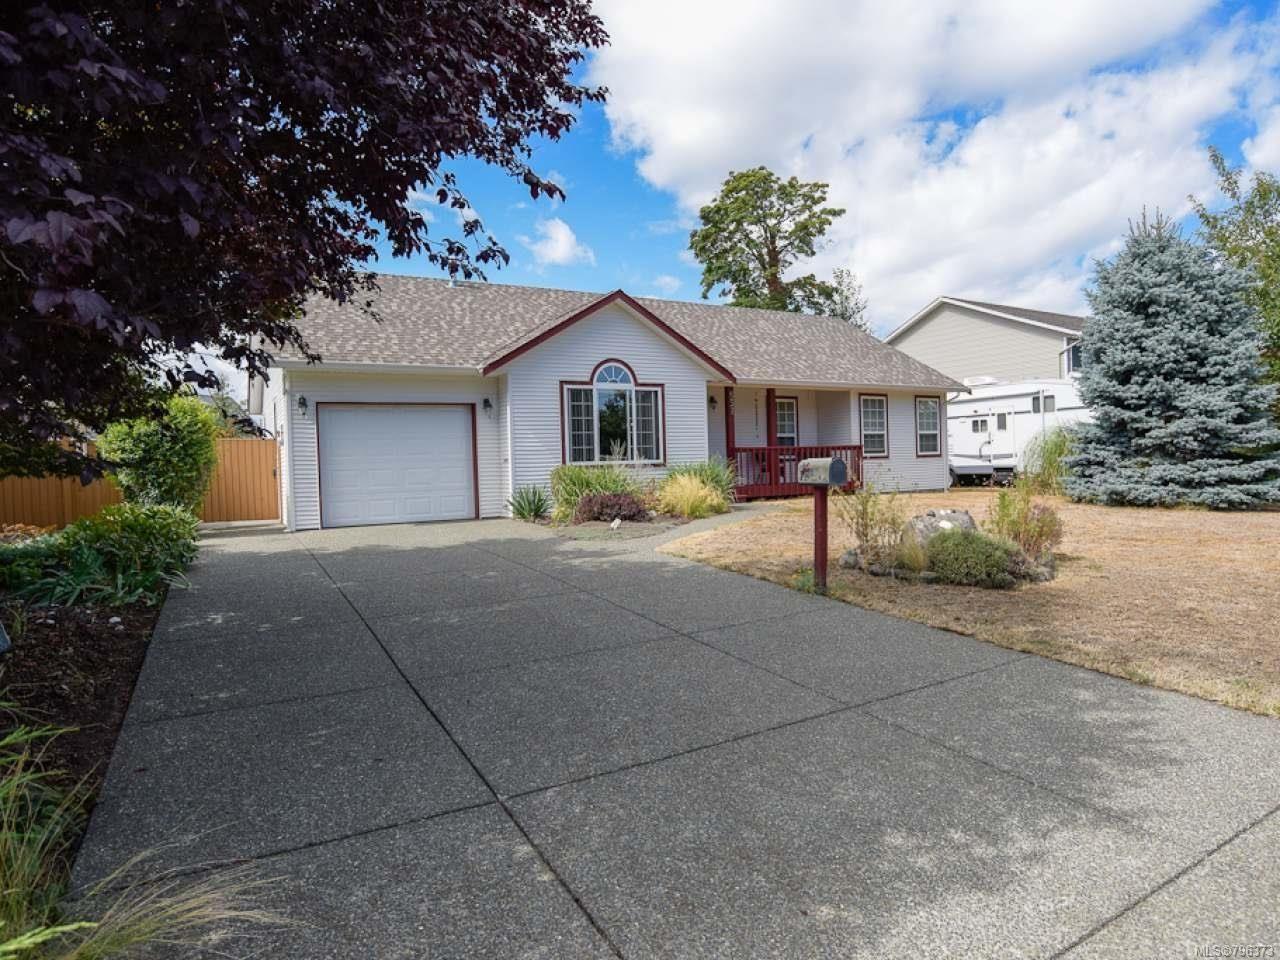 Main Photo: 557 HAIDA STREET in COMOX: CV Comox (Town of) House for sale (Comox Valley)  : MLS®# 796373